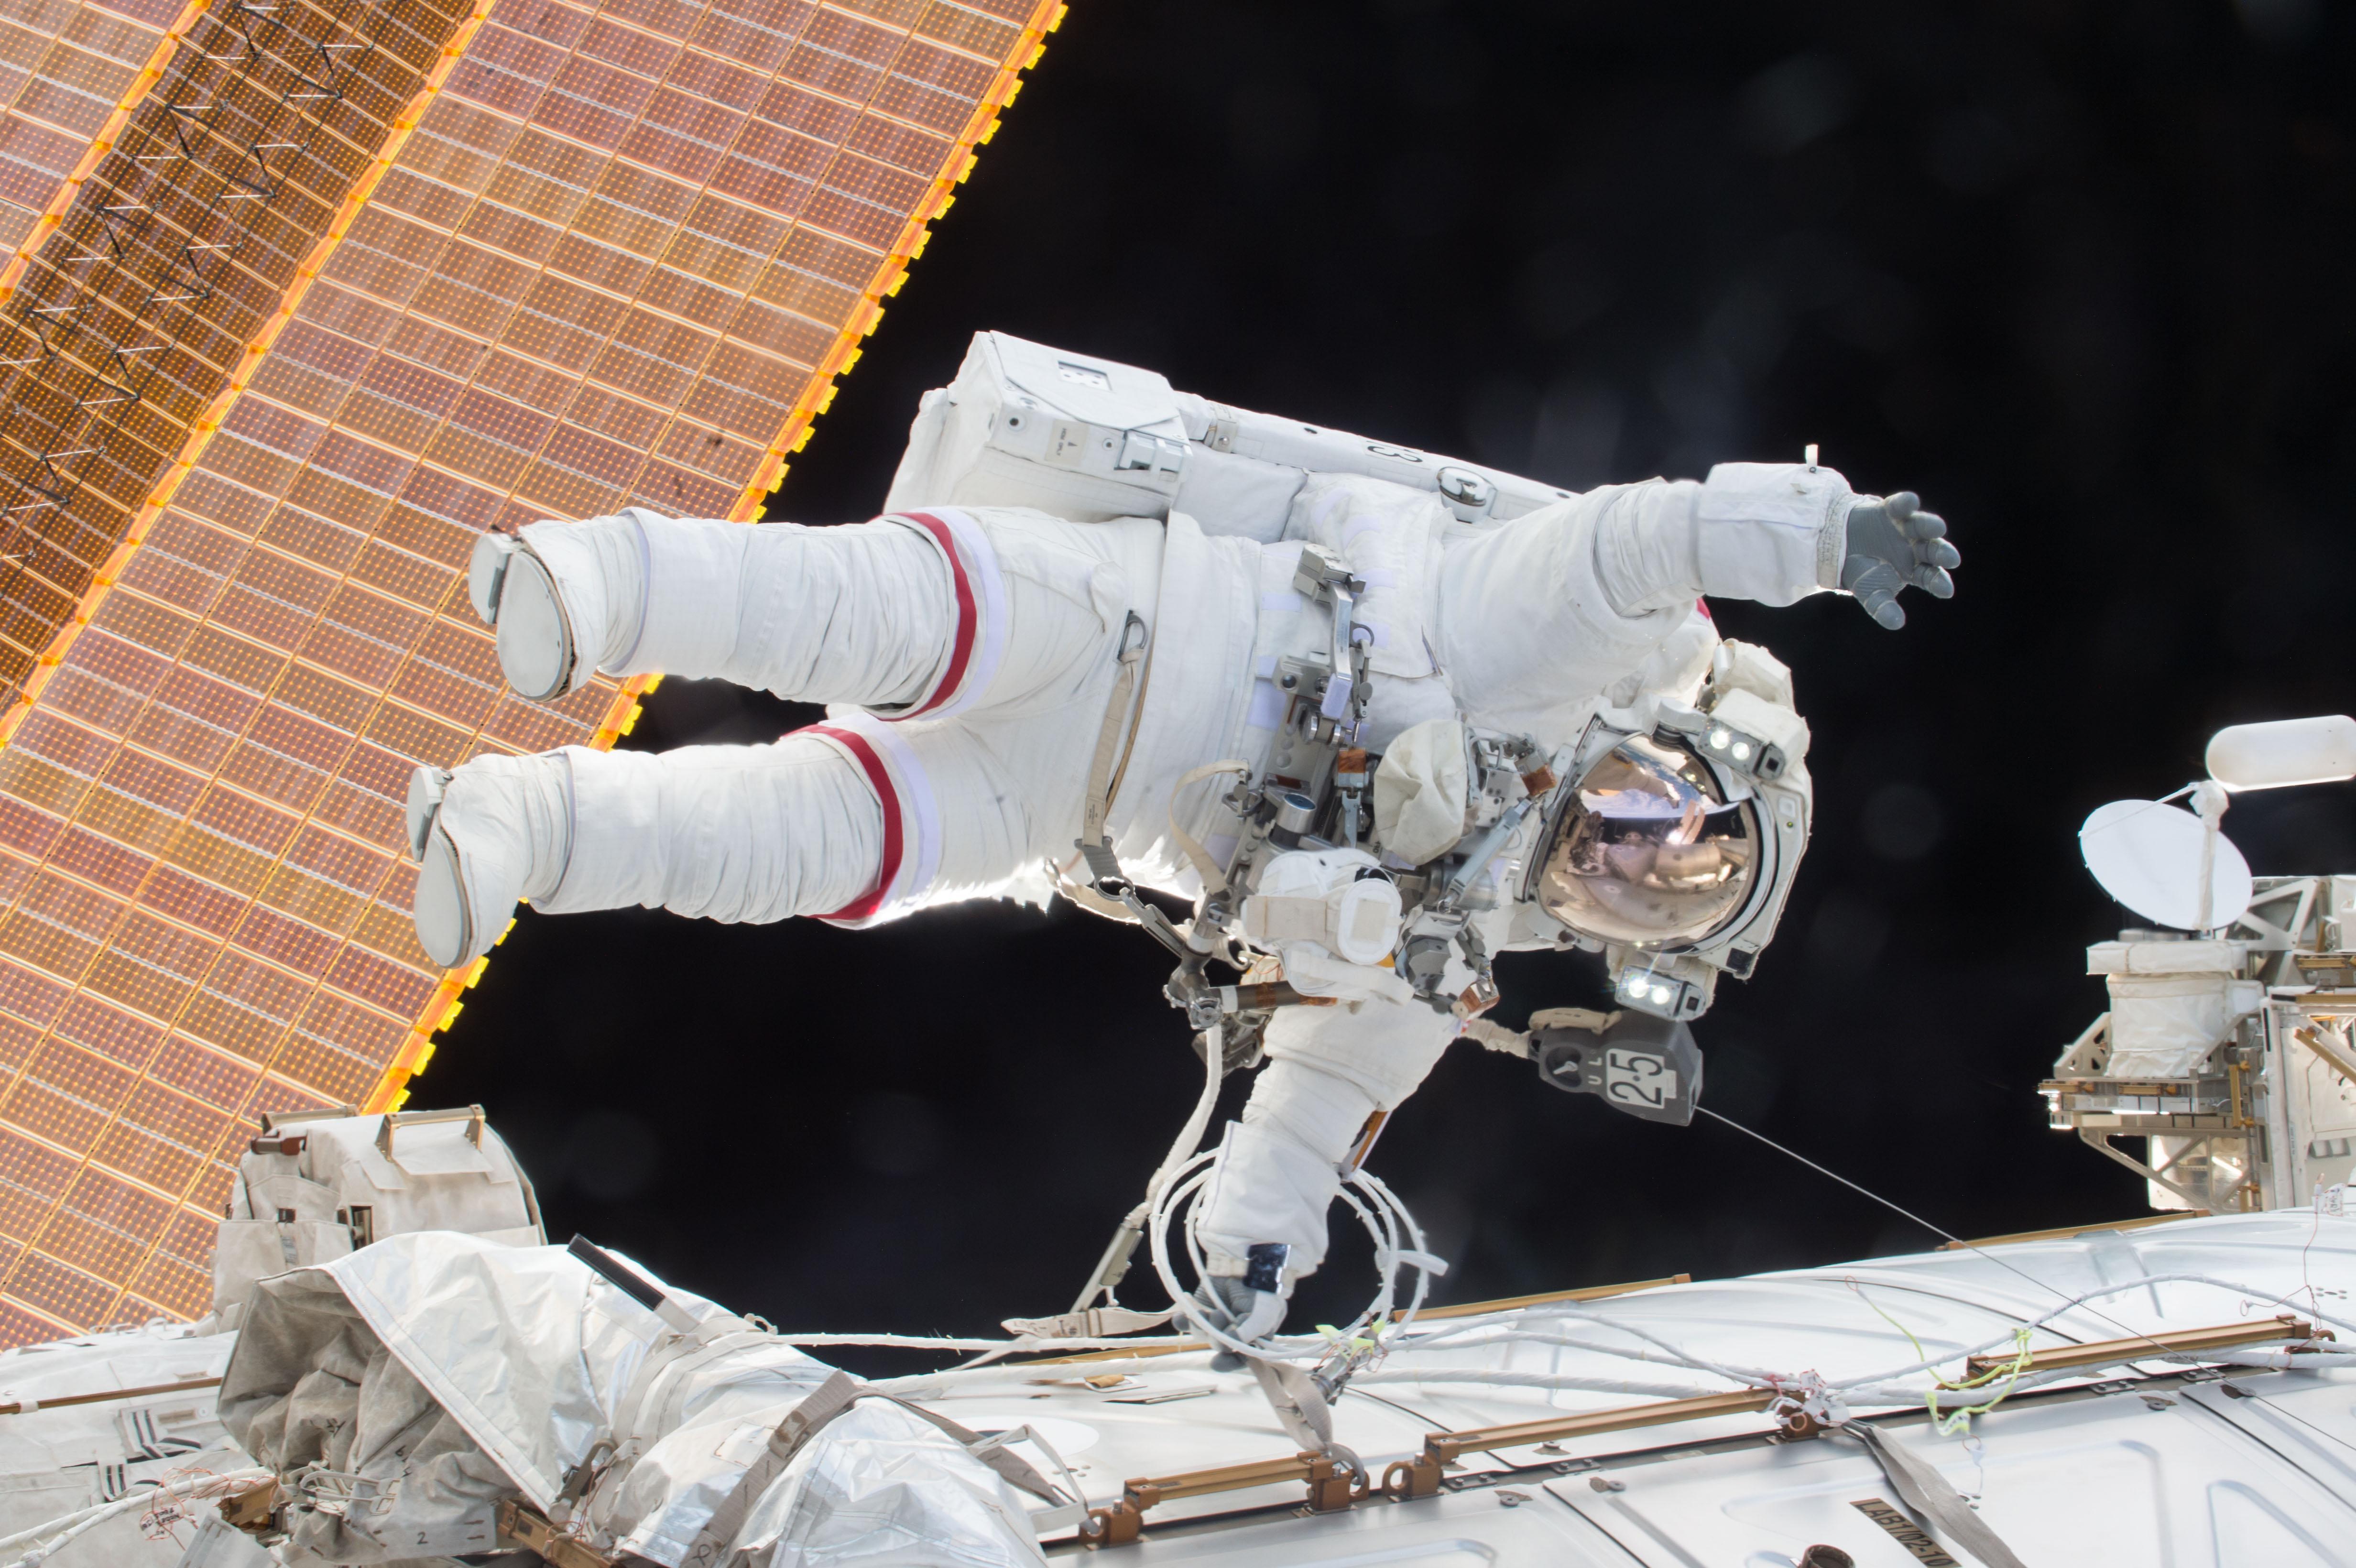 Kelly made an unplanned spacewalk